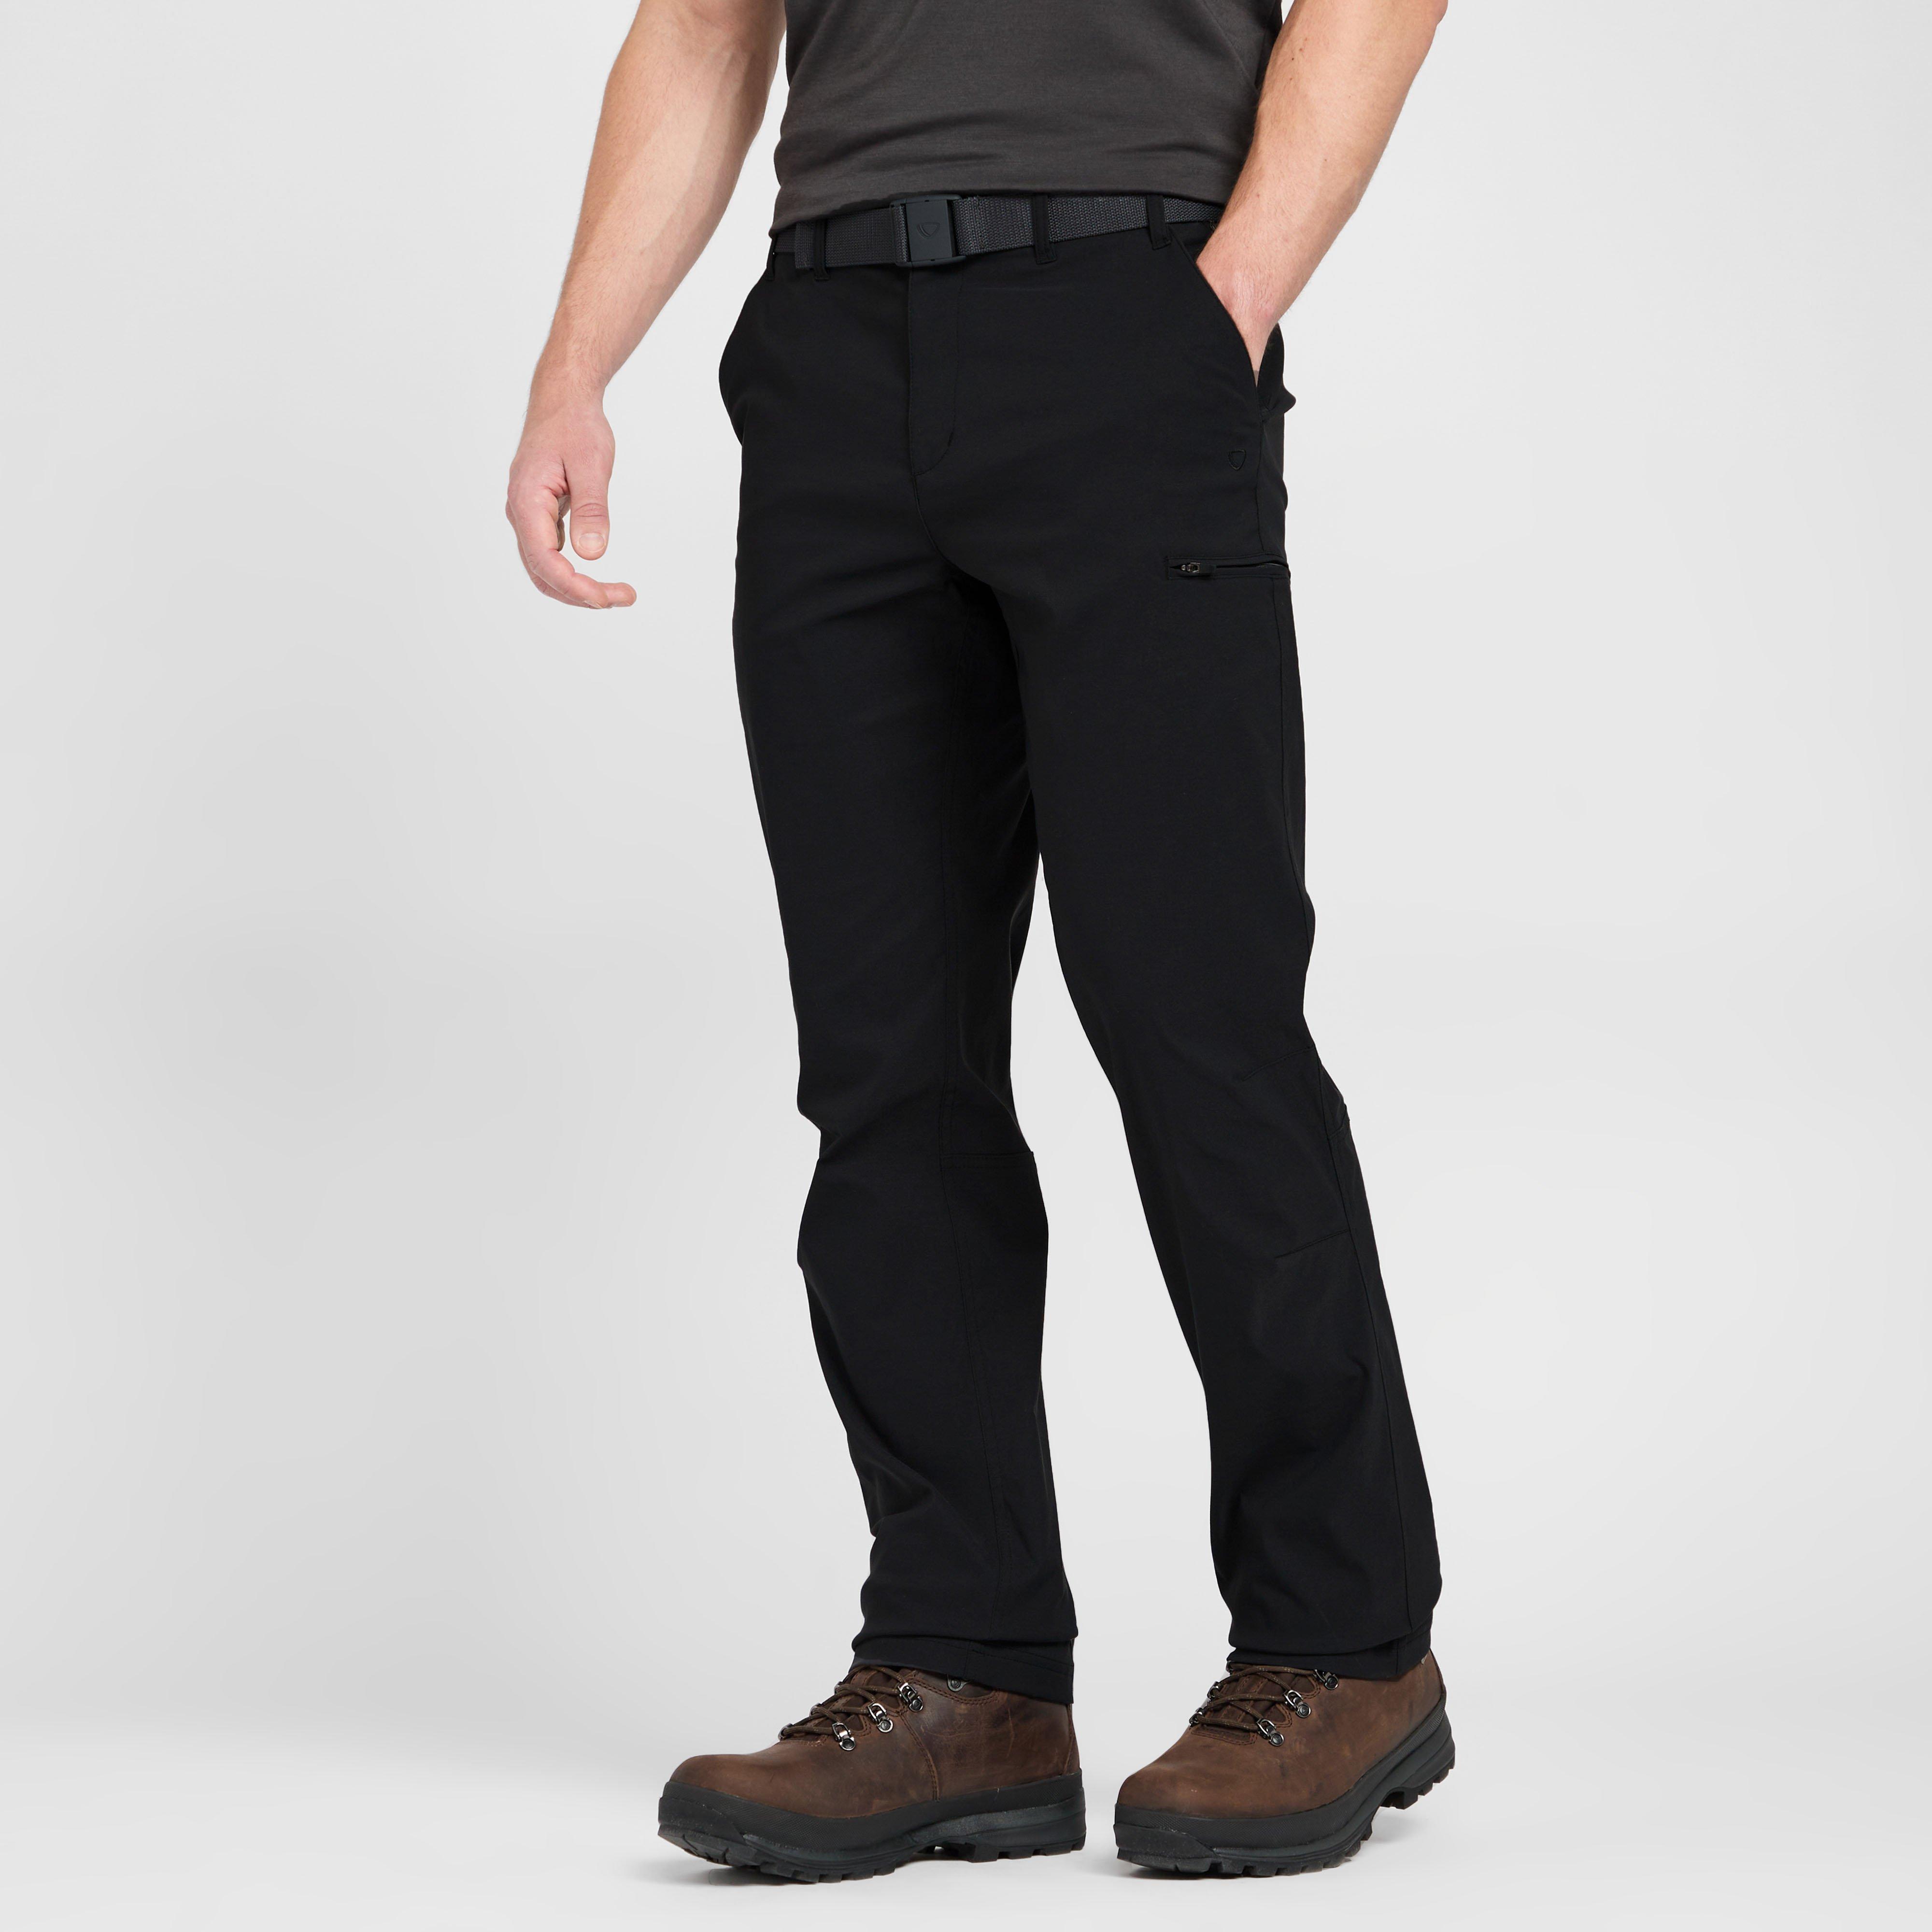 Brasher Brasher Mens Stretch Trousers - Black, Black